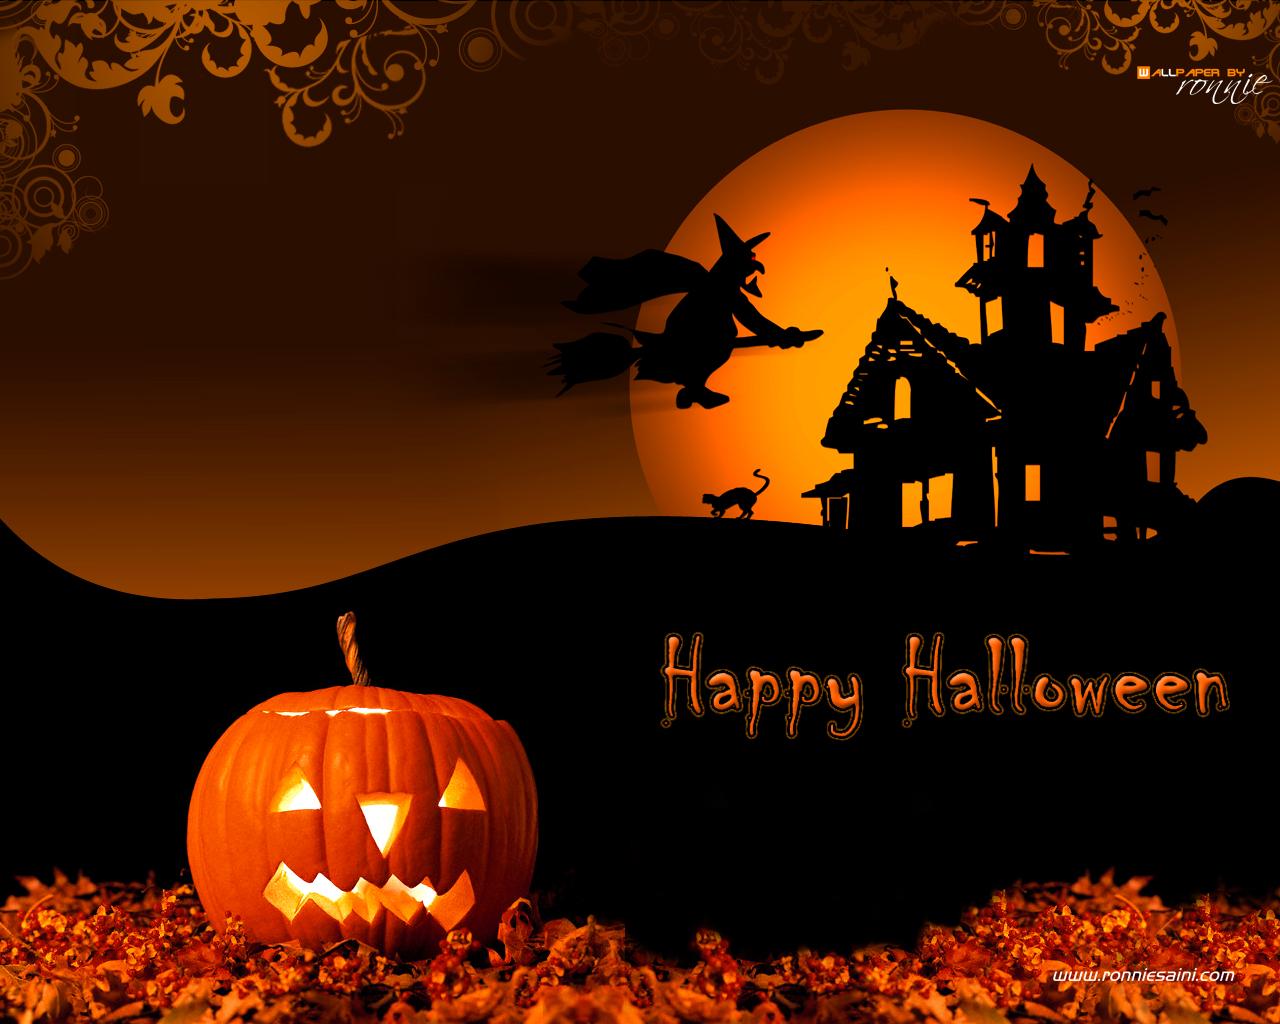 halloween wallpaper images   SF Wallpaper 1280x1024